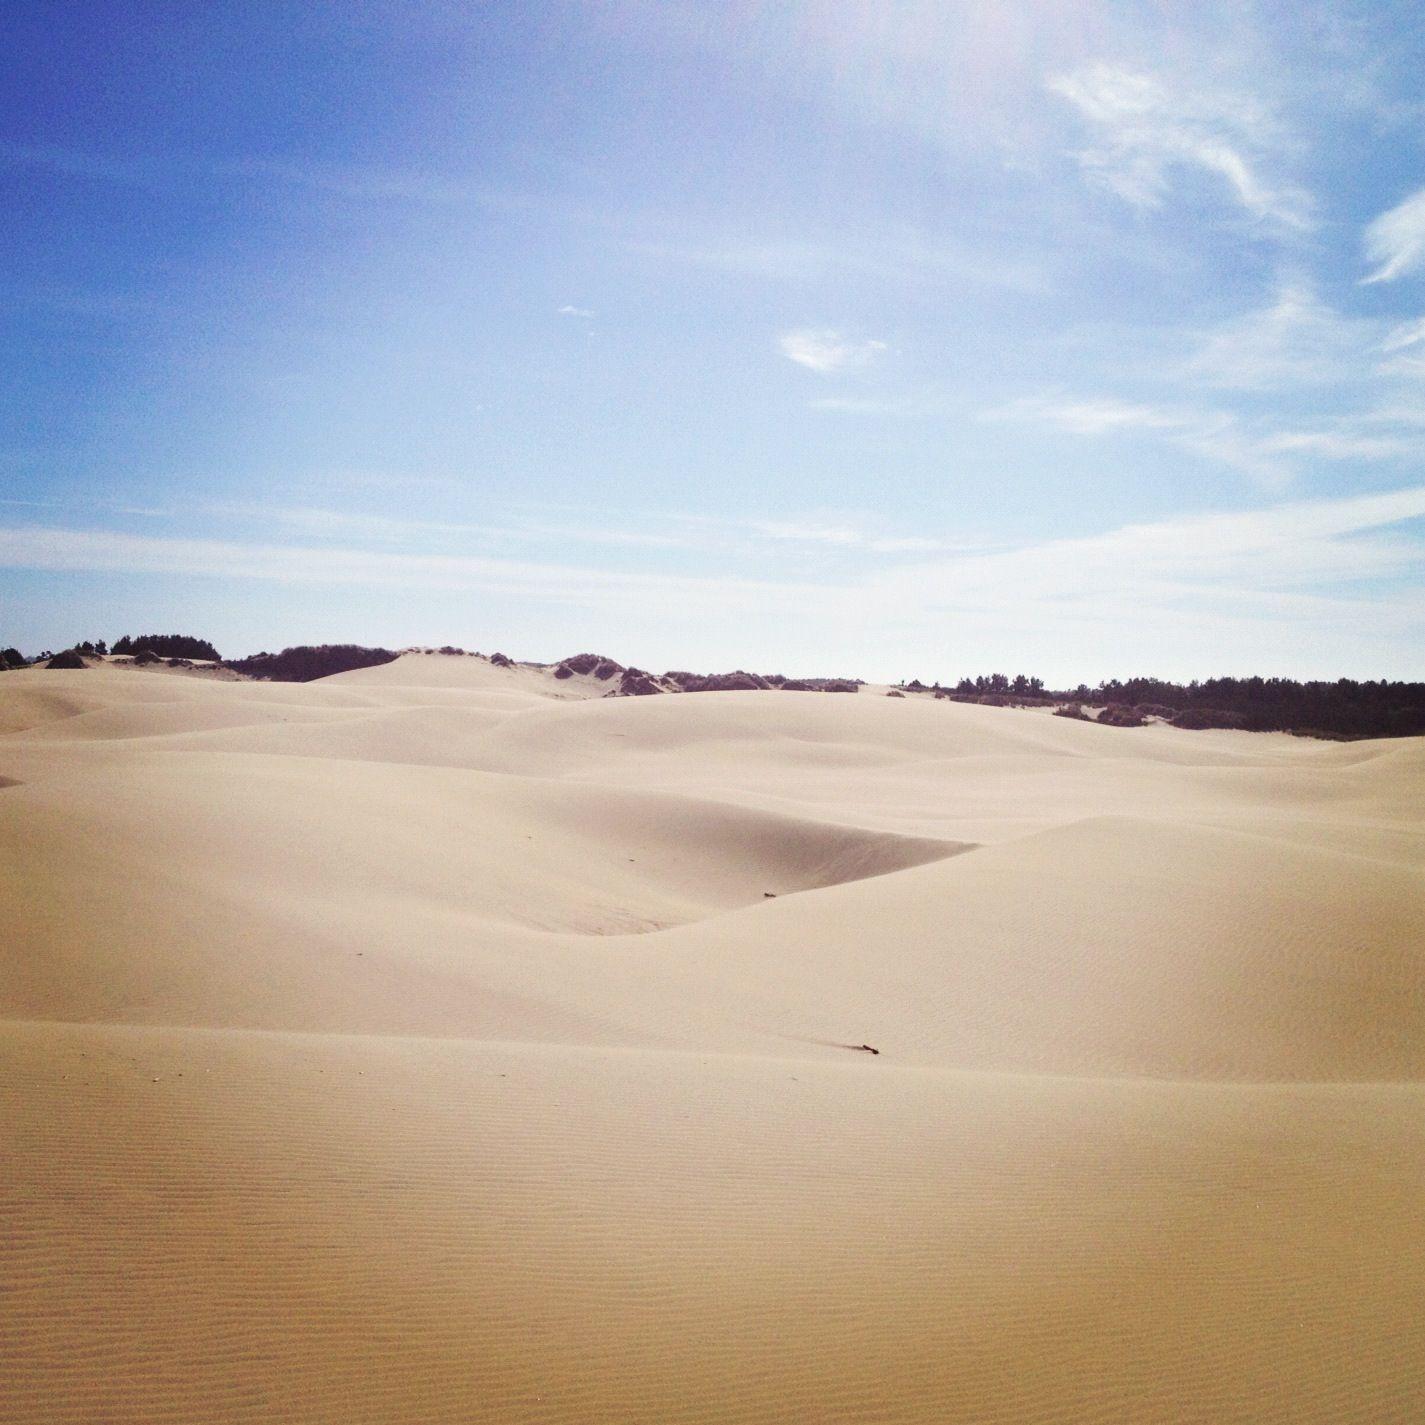 Oregon Sand Dunes.